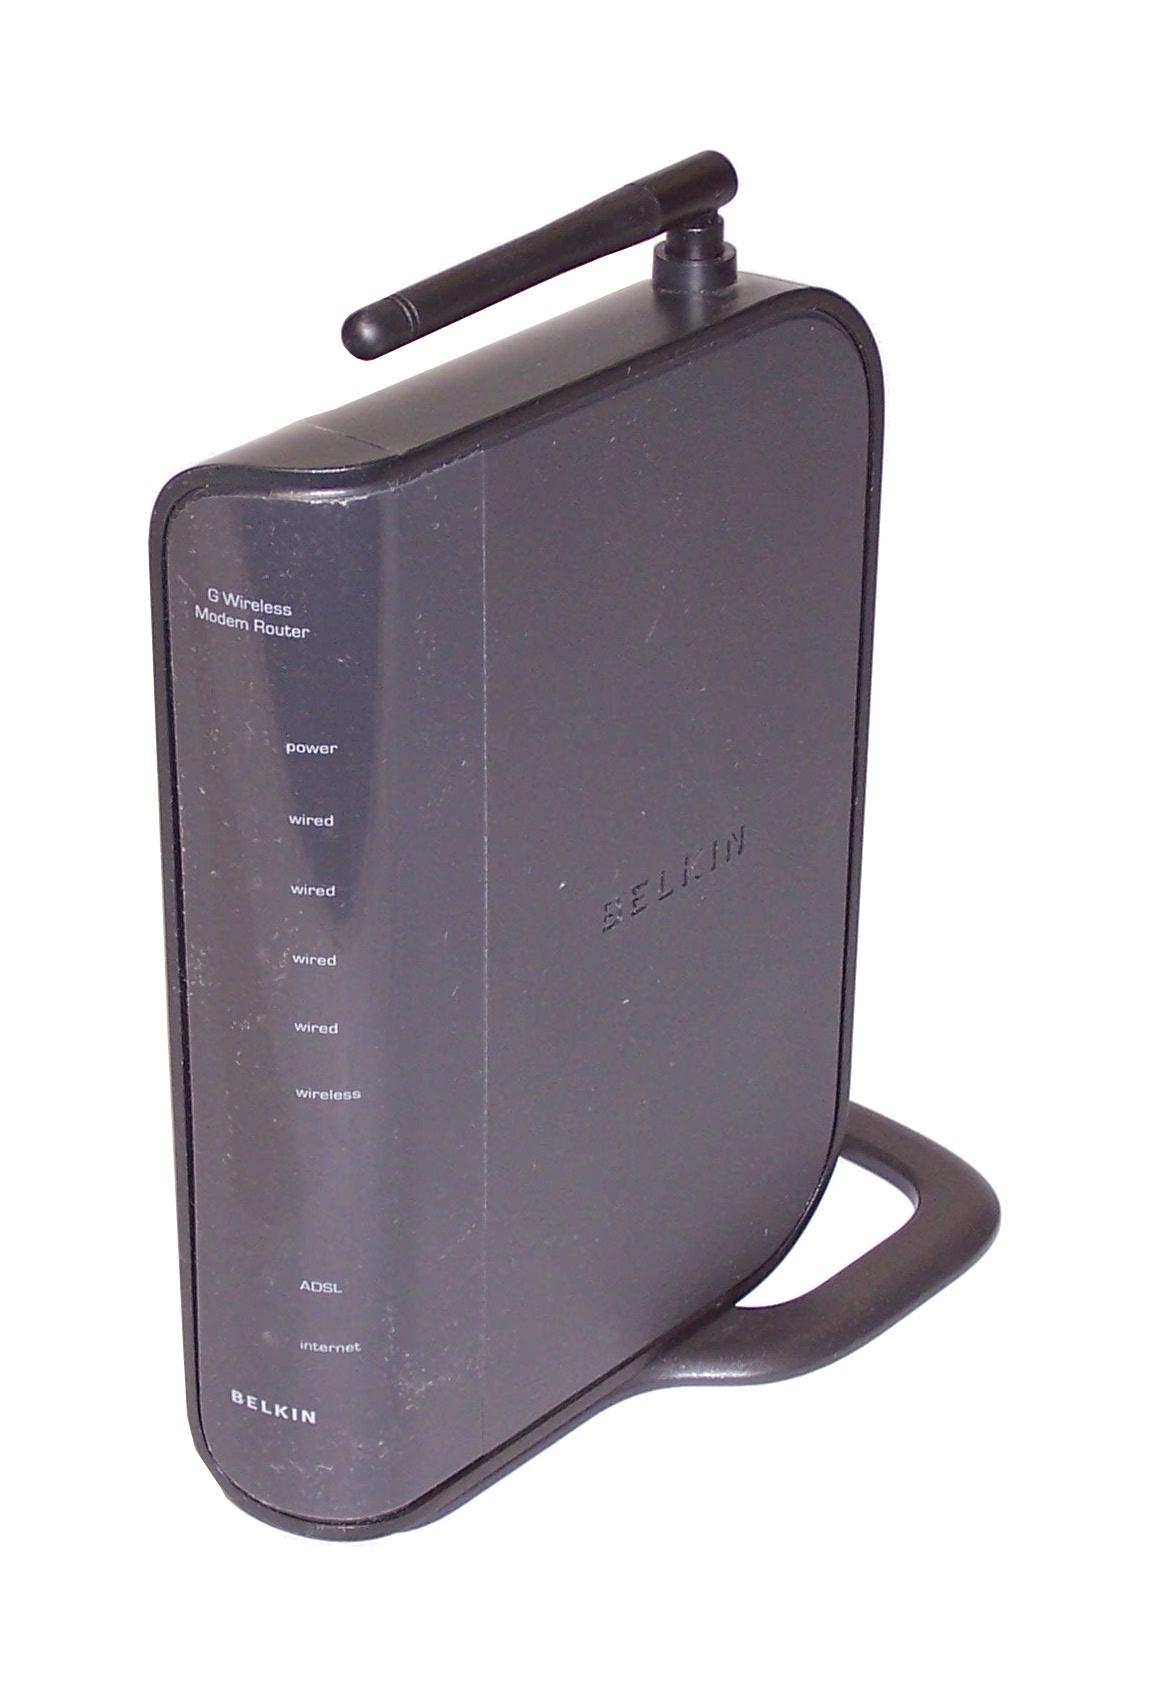 Belkin F5D7634-4 v2 G Wireless Modem Router bundle With Power Supply